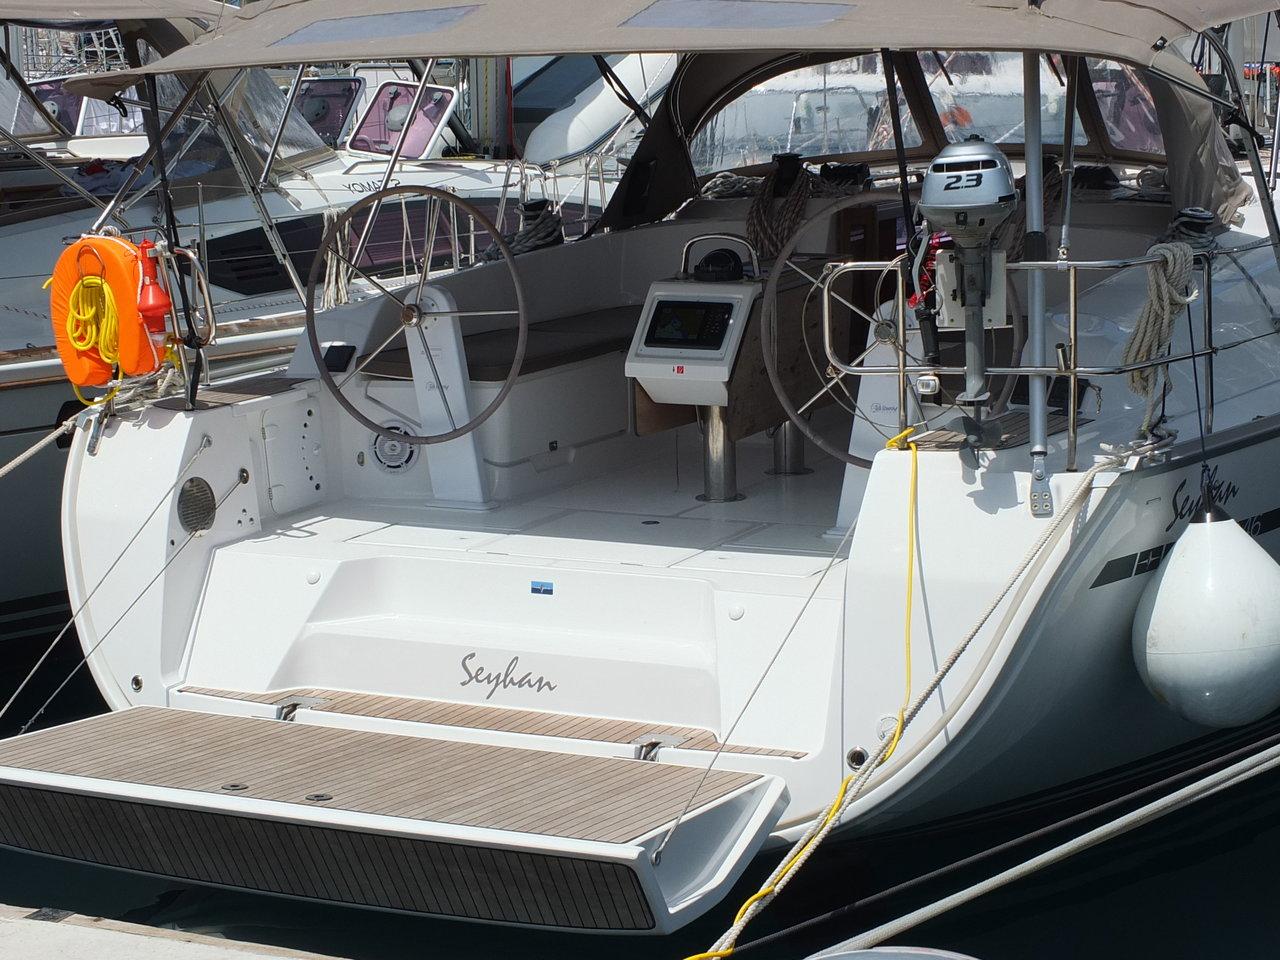 pitter yachting yachtcharter bavaria cruiser 46 4 cab seyhan. Black Bedroom Furniture Sets. Home Design Ideas